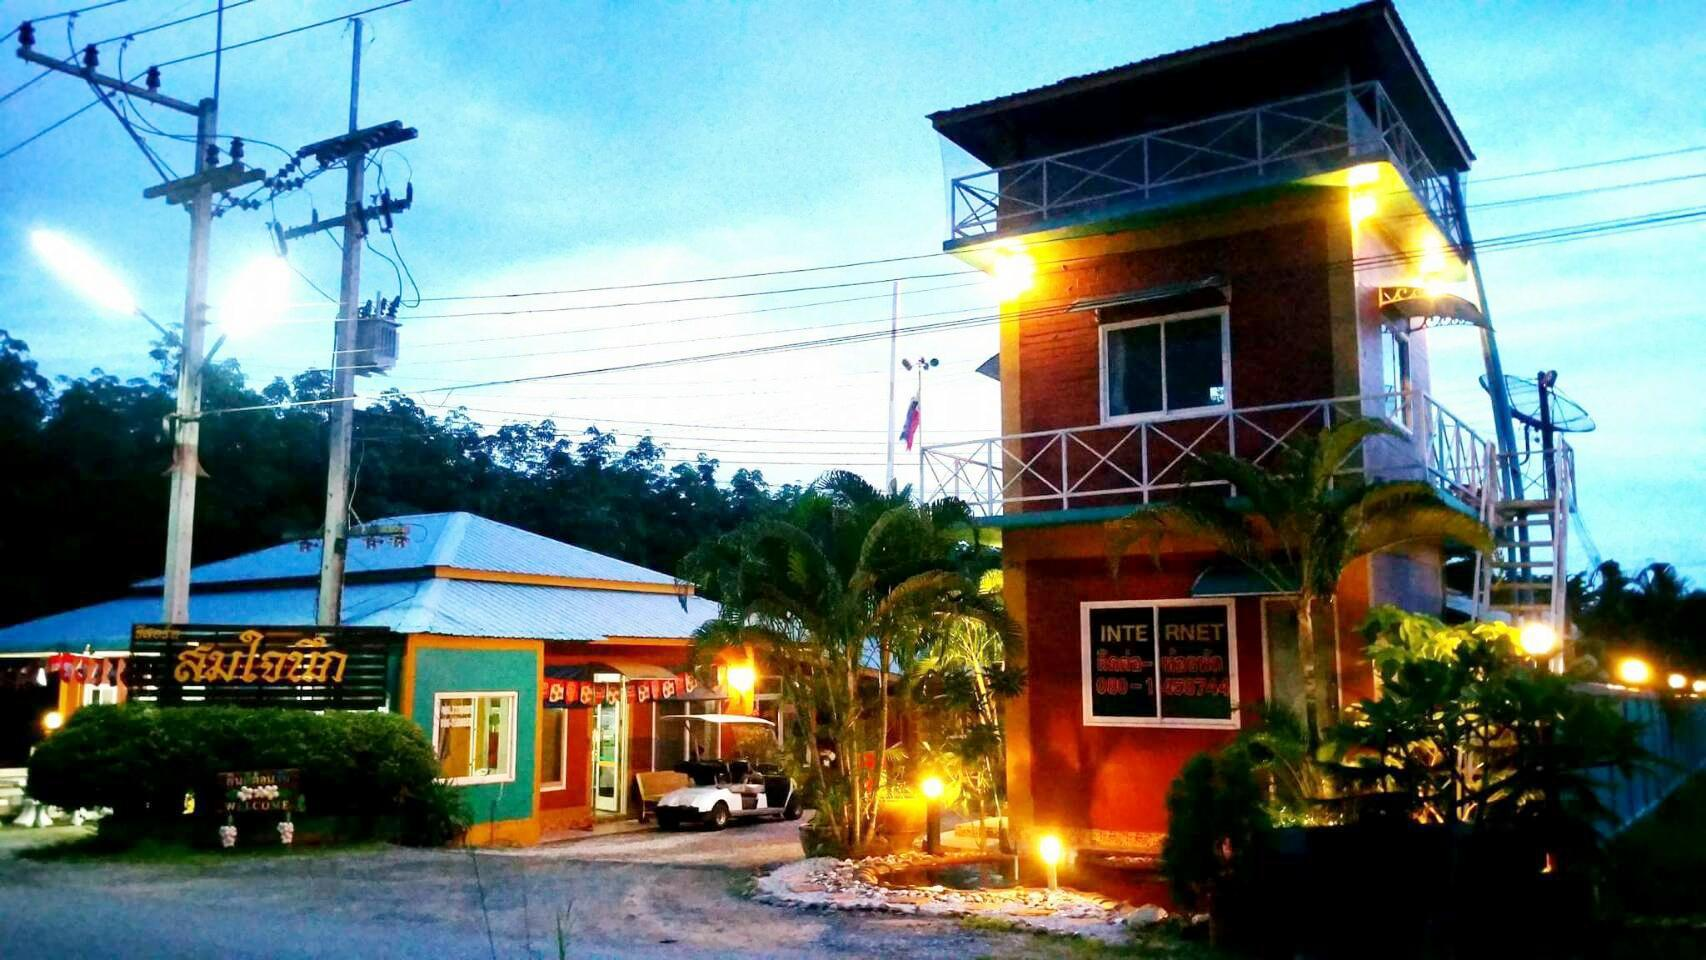 Somjainuk resort 2 / 1 BR/ free breakfast / wifi Somjainuk resort 2 / 1 BR/ free breakfast / wifi